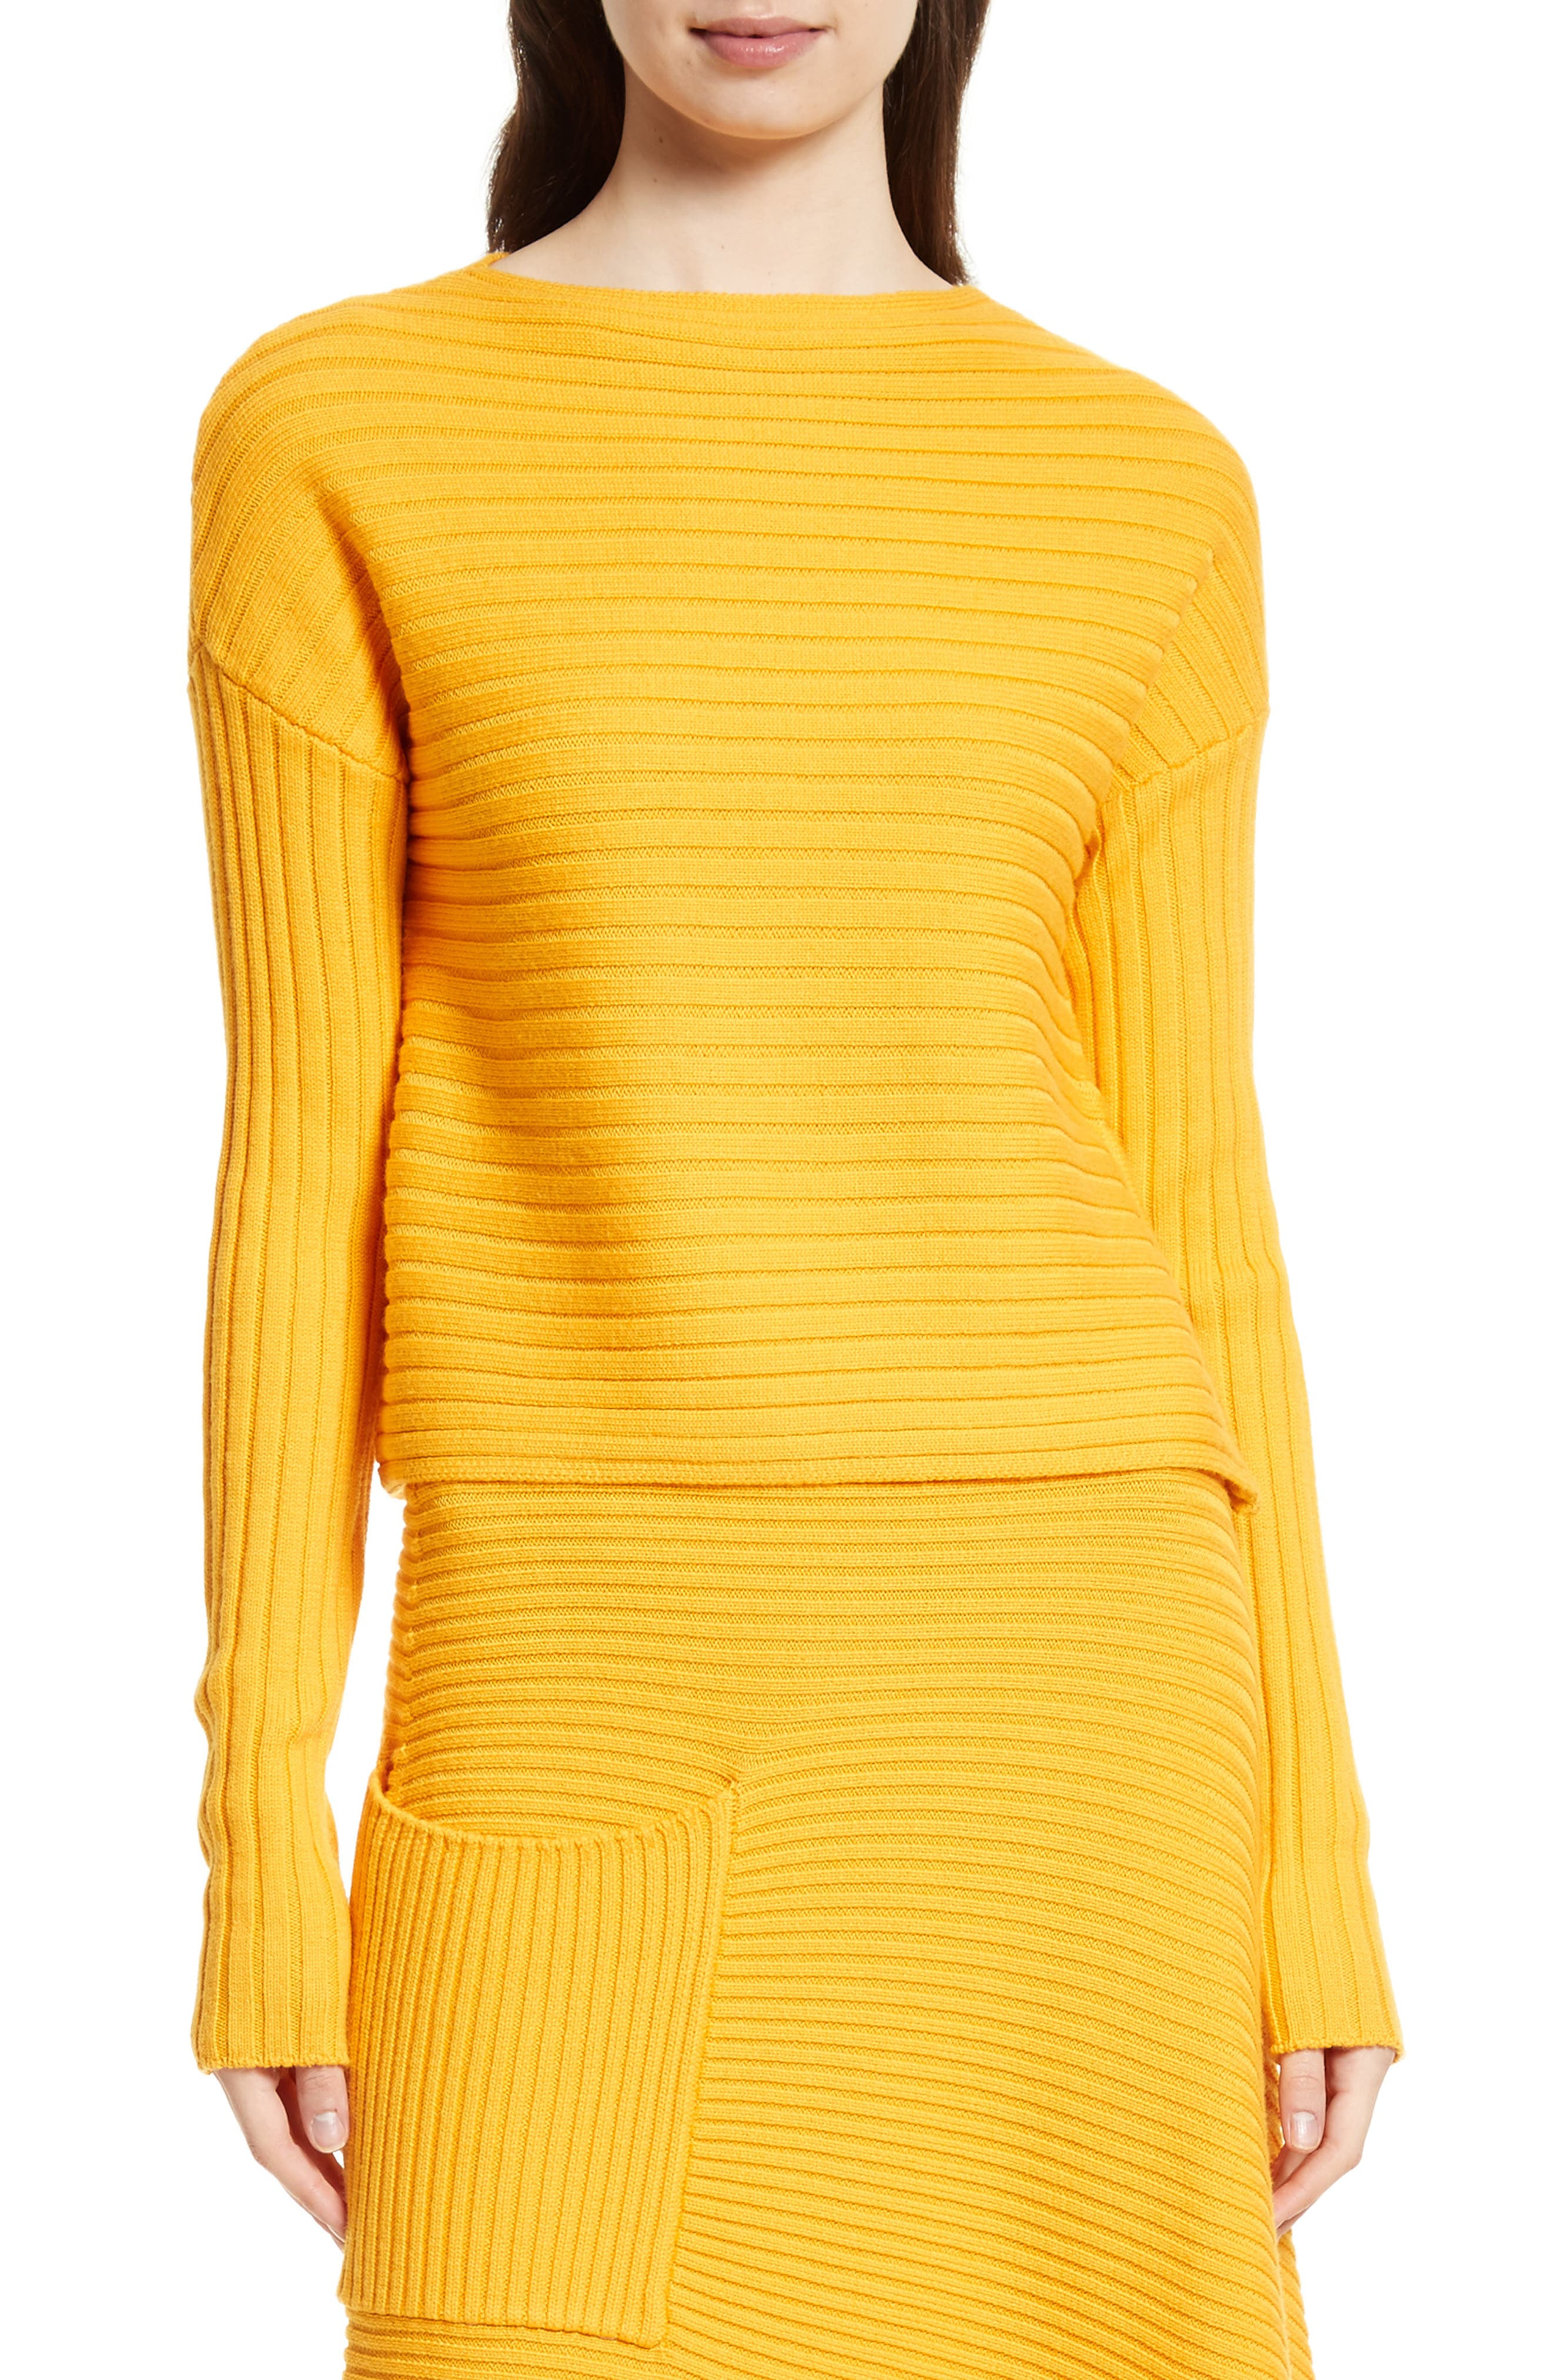 Alternate Image 1 Selected - Tibi Ribbed Wool Sweater